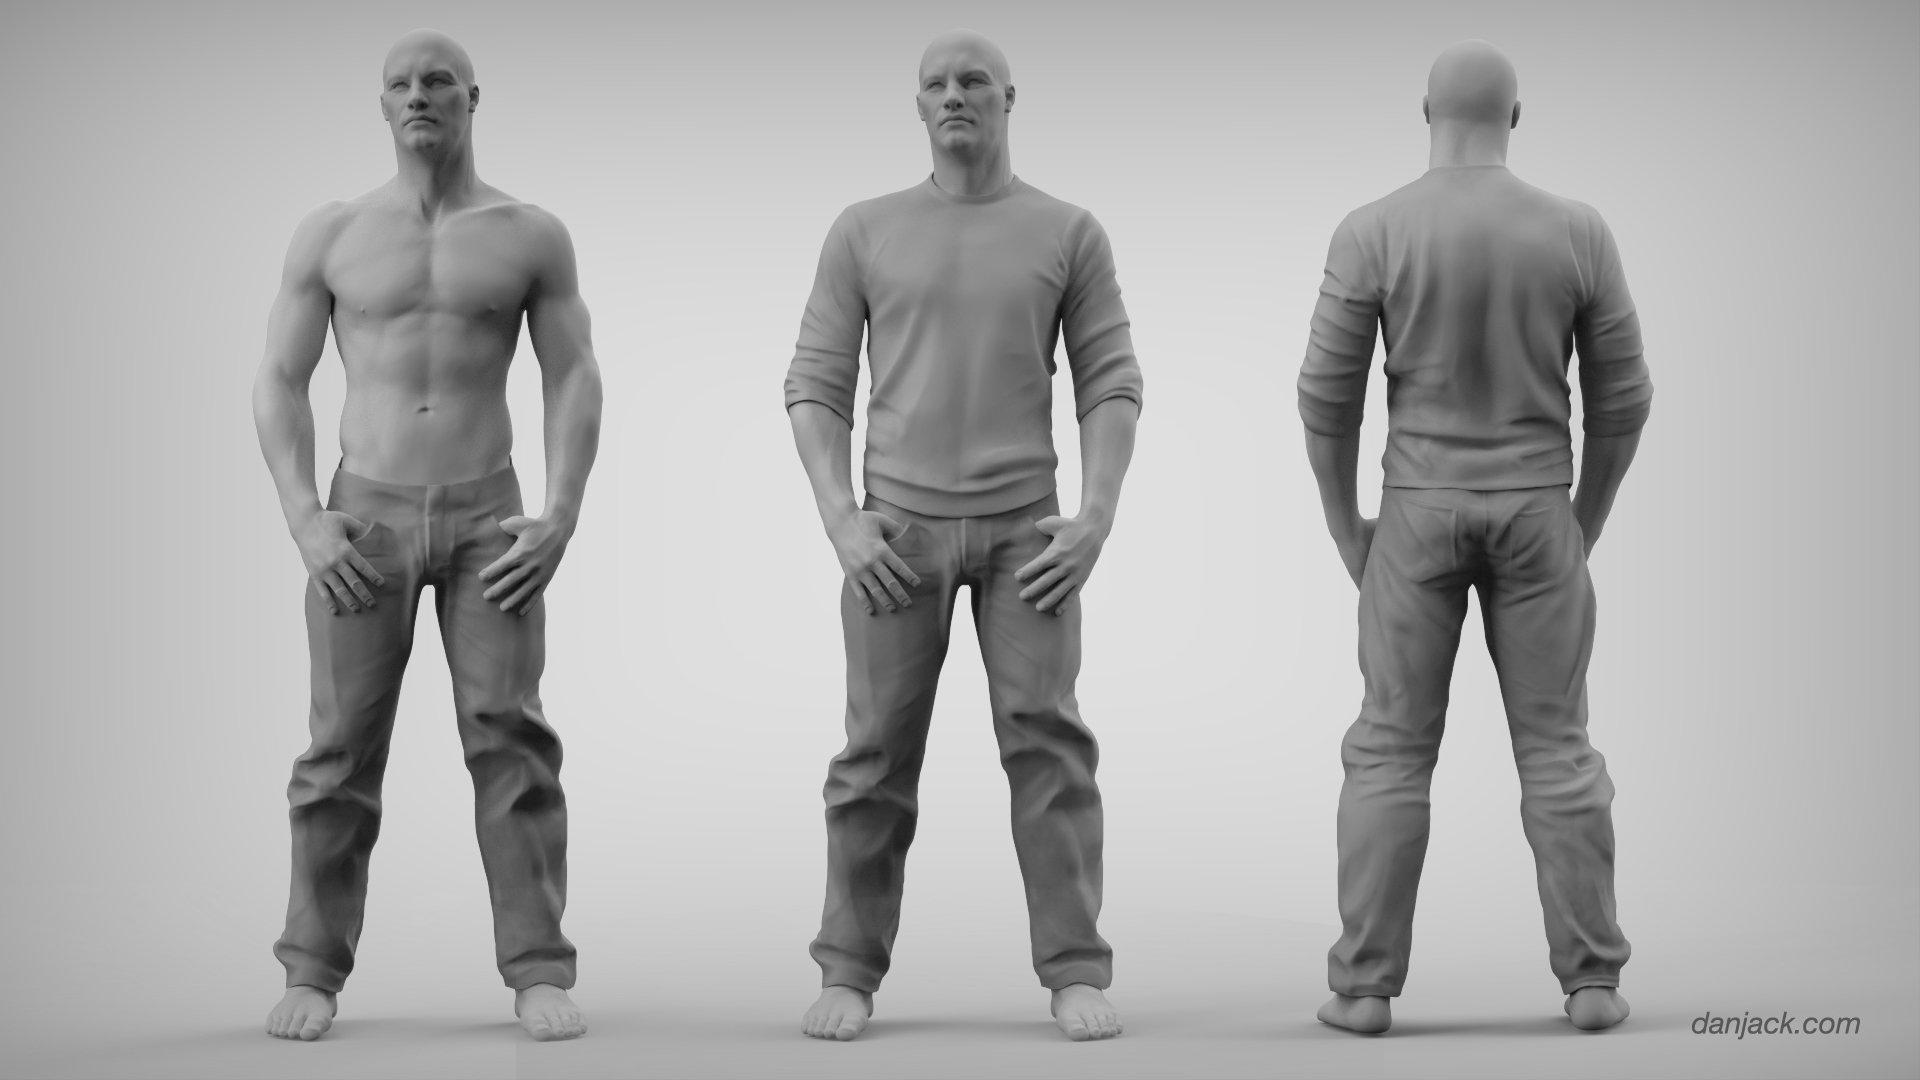 ArtStation - Male Anatomy/Fabric Study, Dan Jack